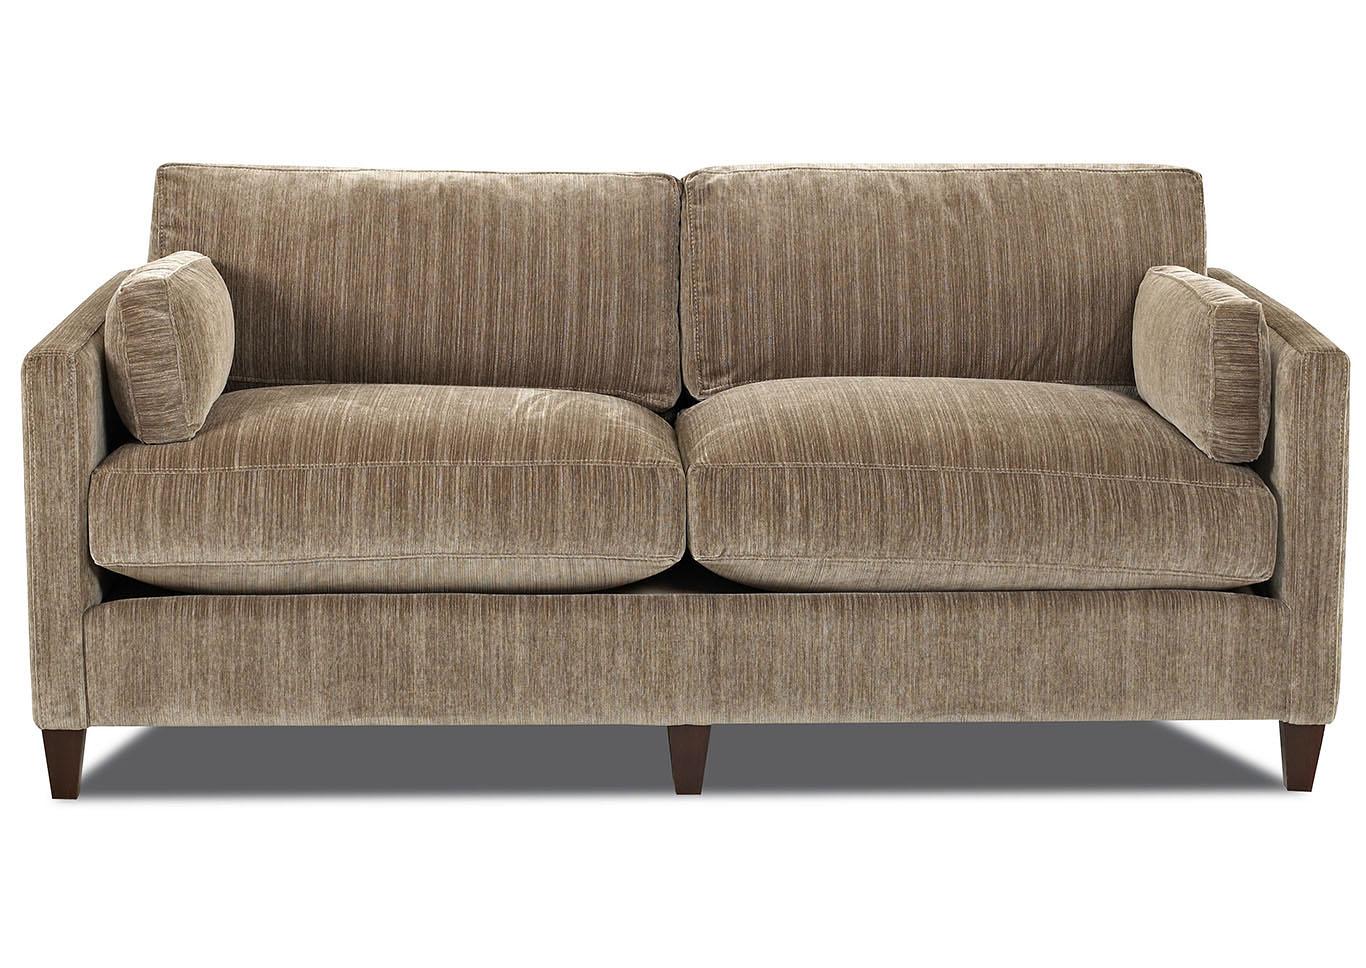 Superb Jordan Aria Stone Stationary Fabric Sofa,Klaussner Home Furnishings